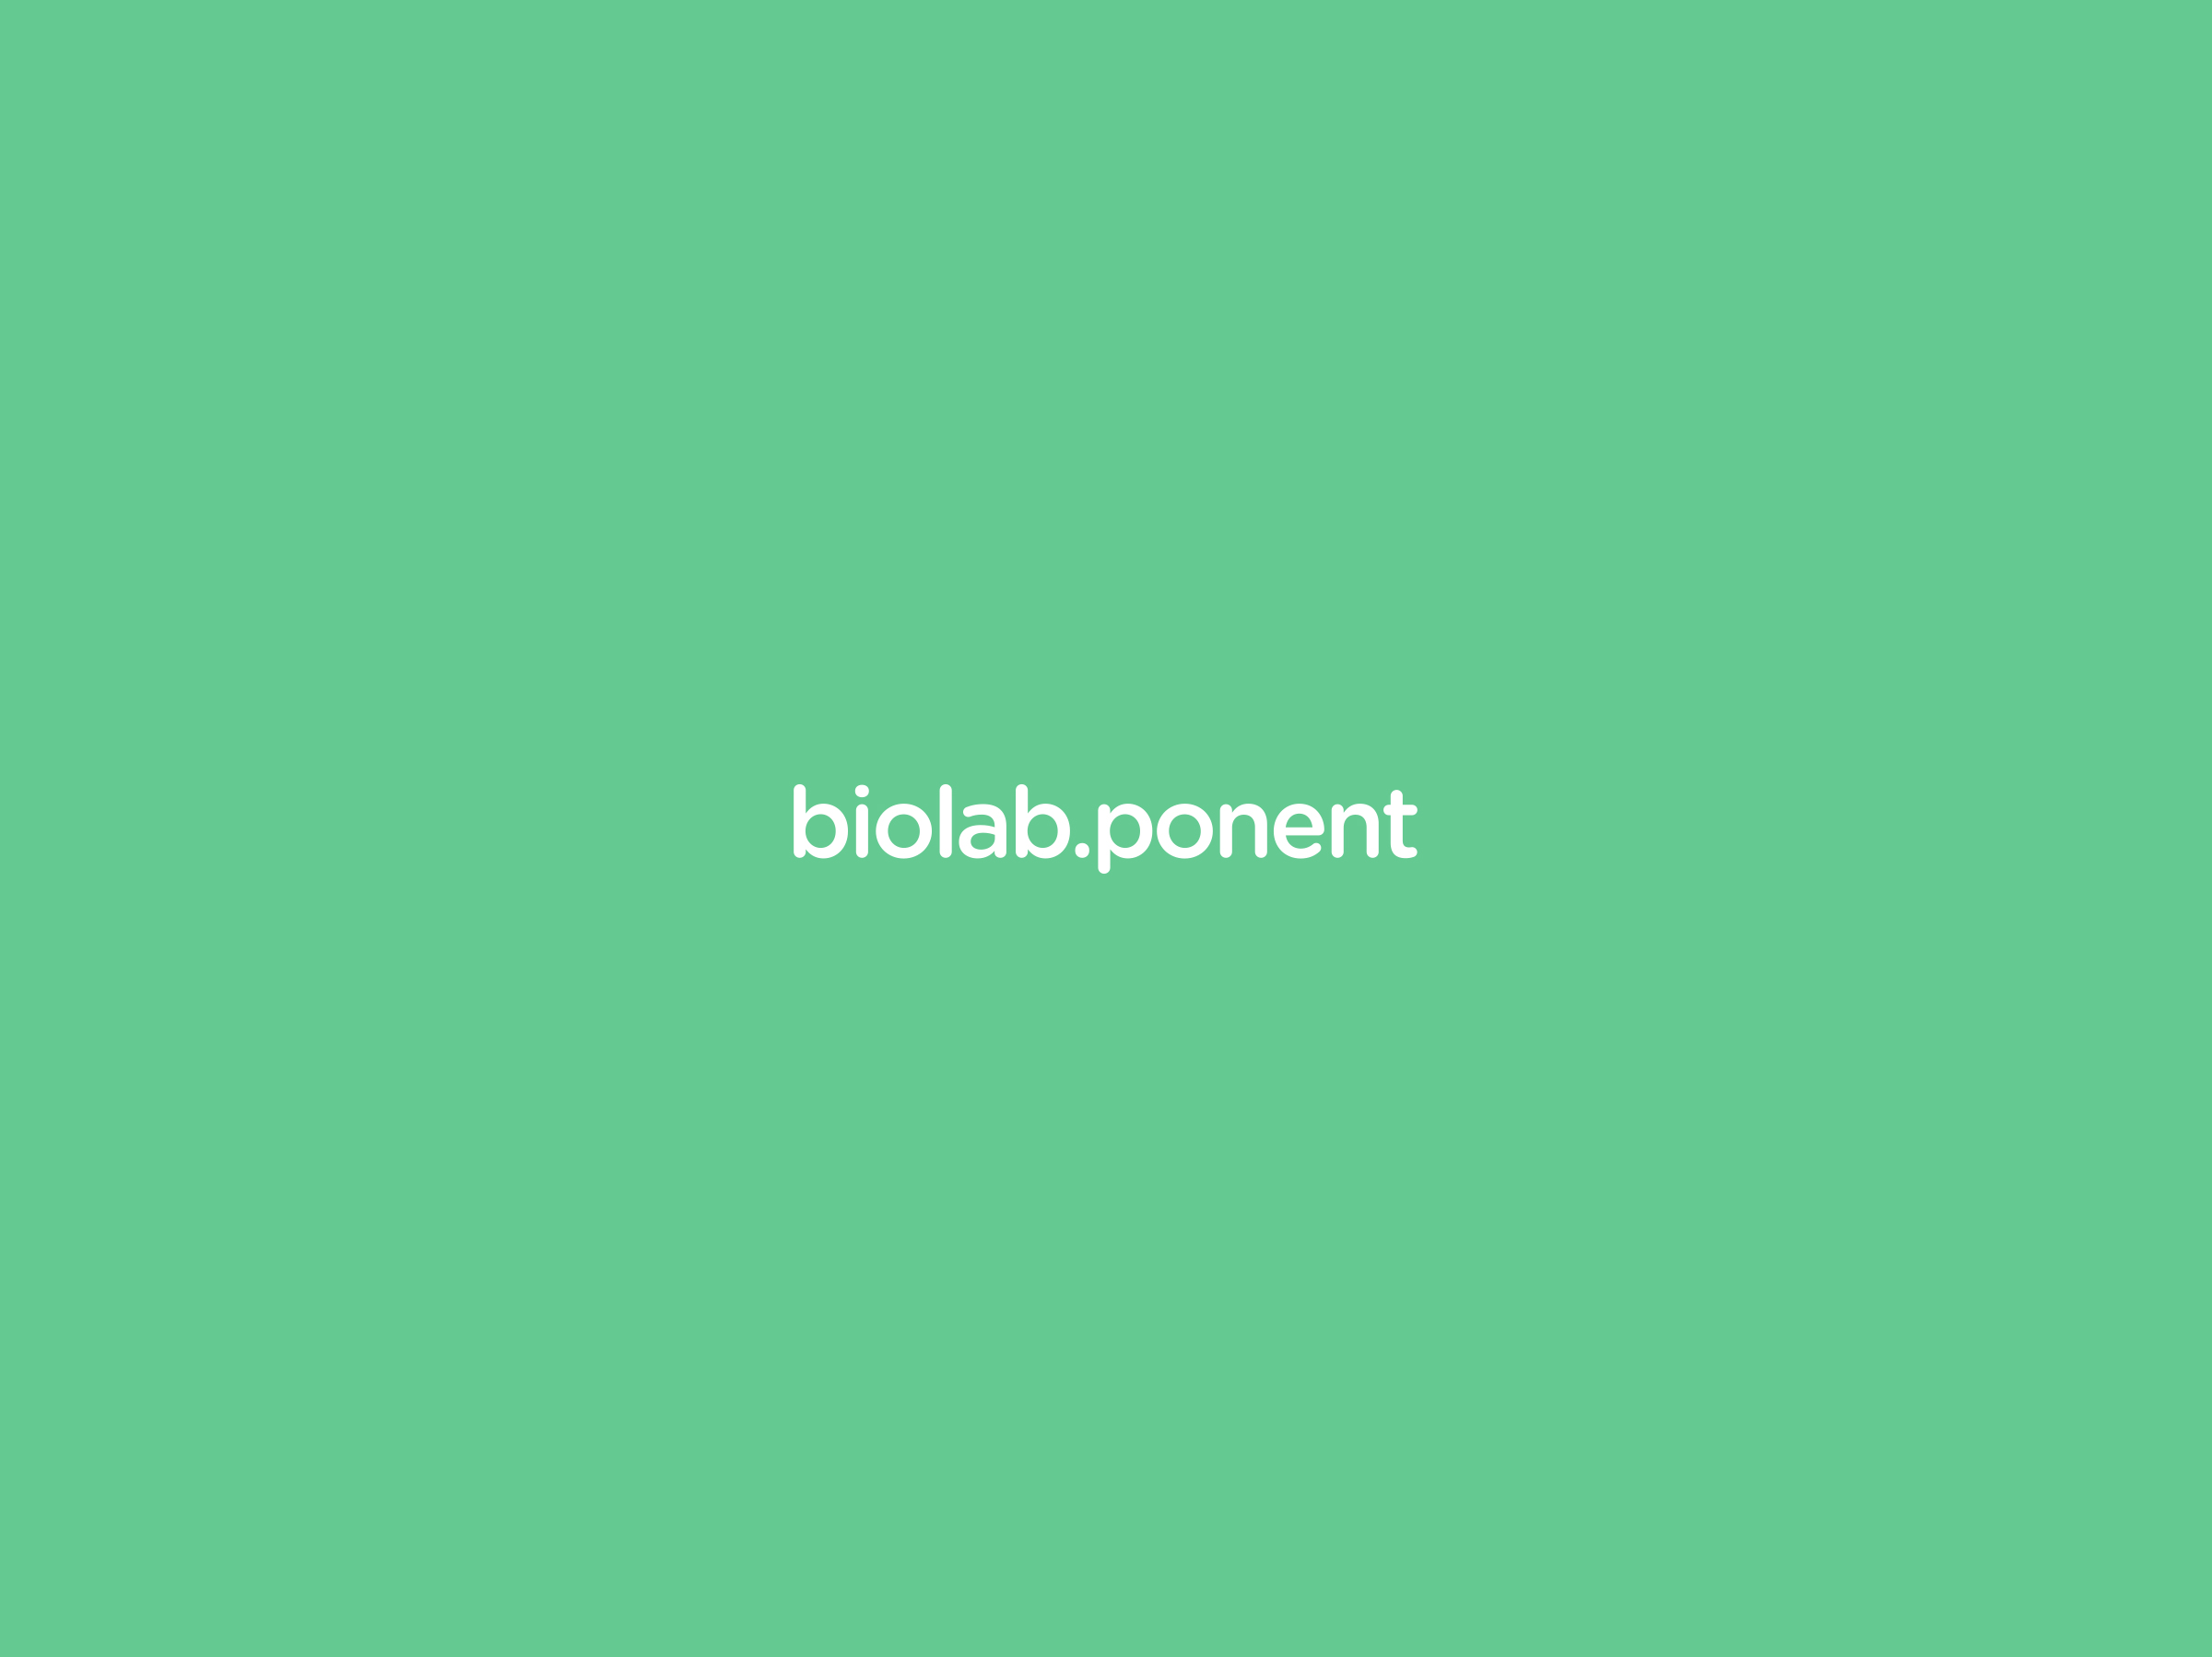 Biolab_Ponent-2019-branding-Latipo-3